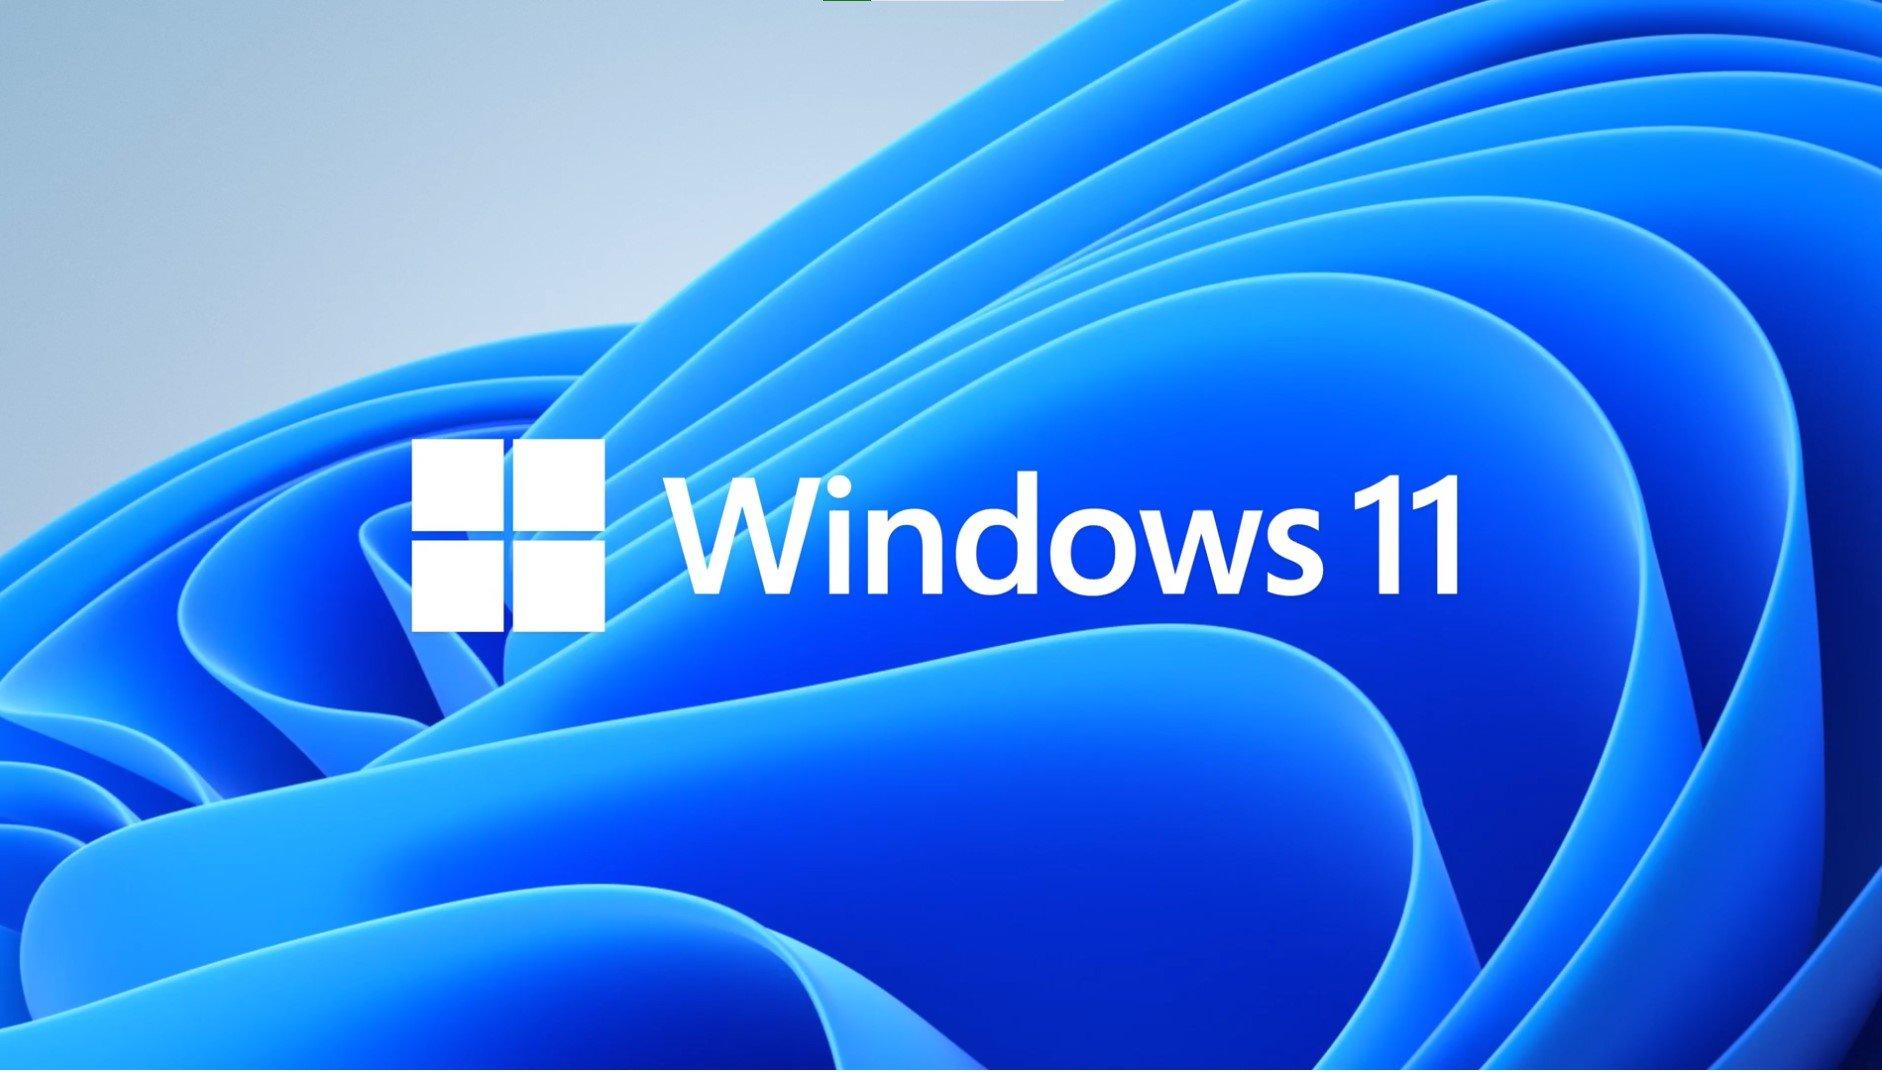 Titelbild mit Windows 11 Logo